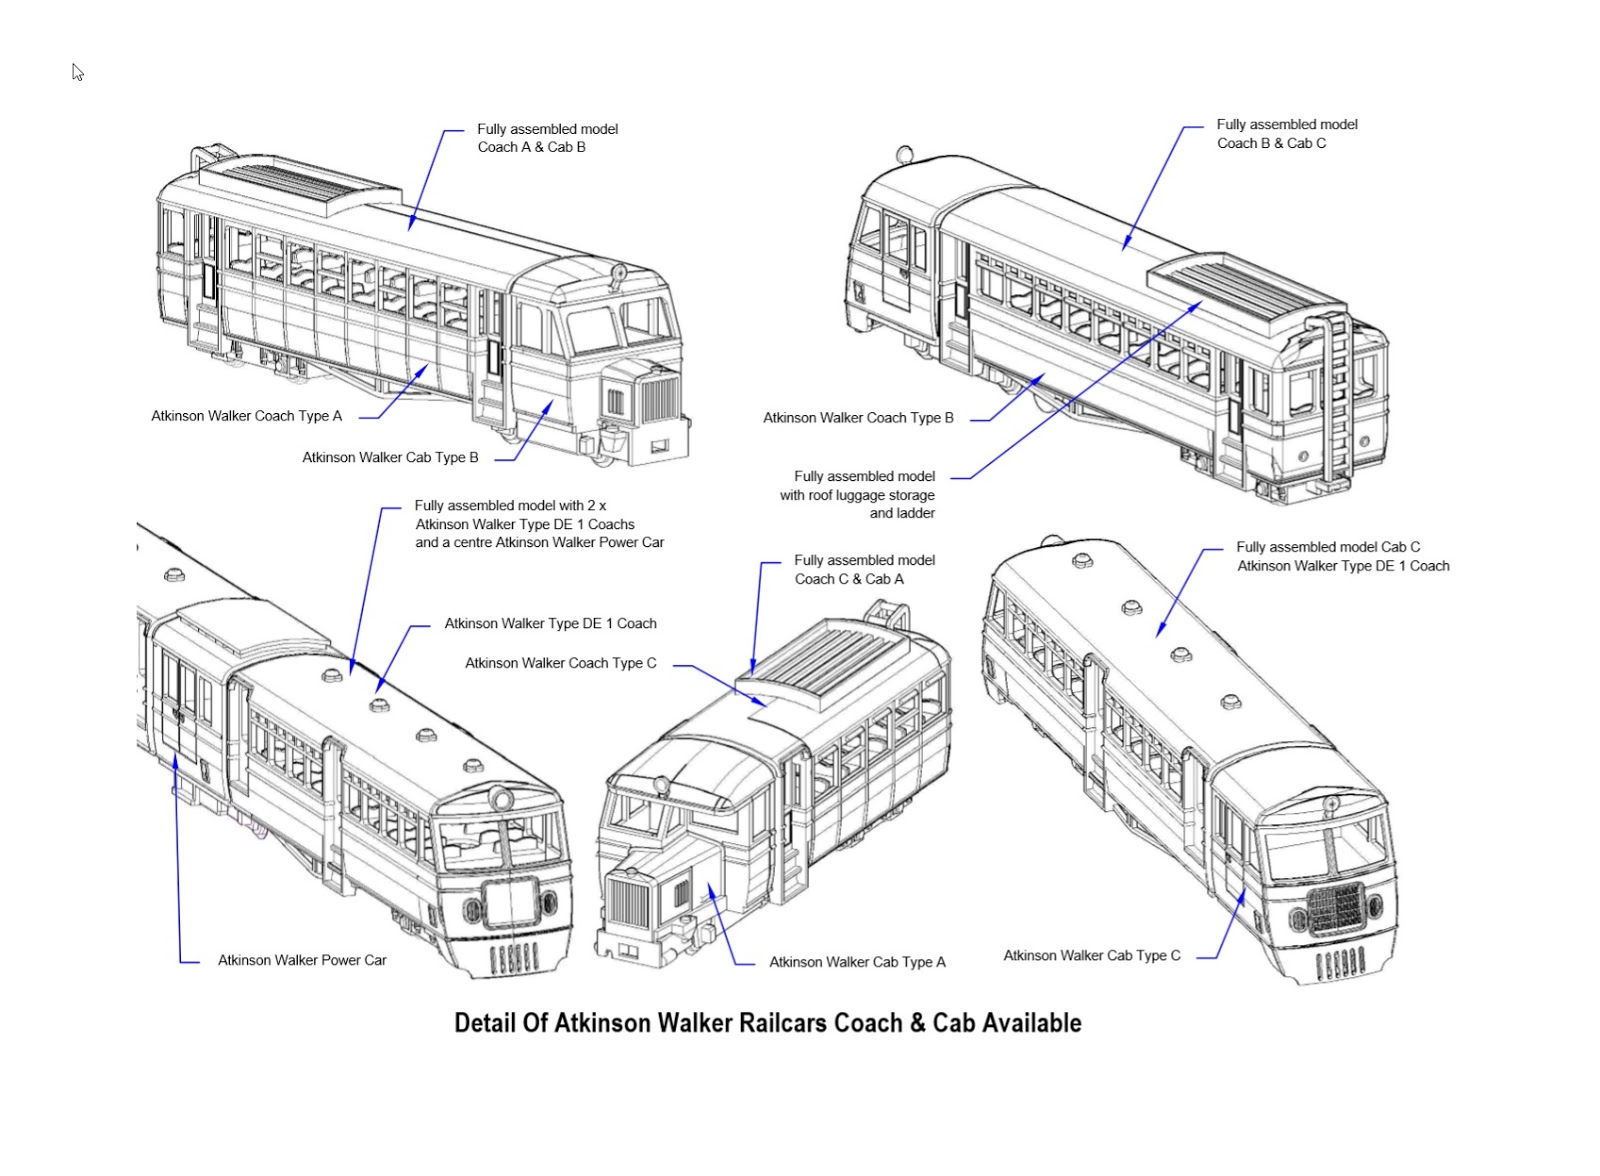 Model Engine Works 009 Atkinson Walker Rail Cars